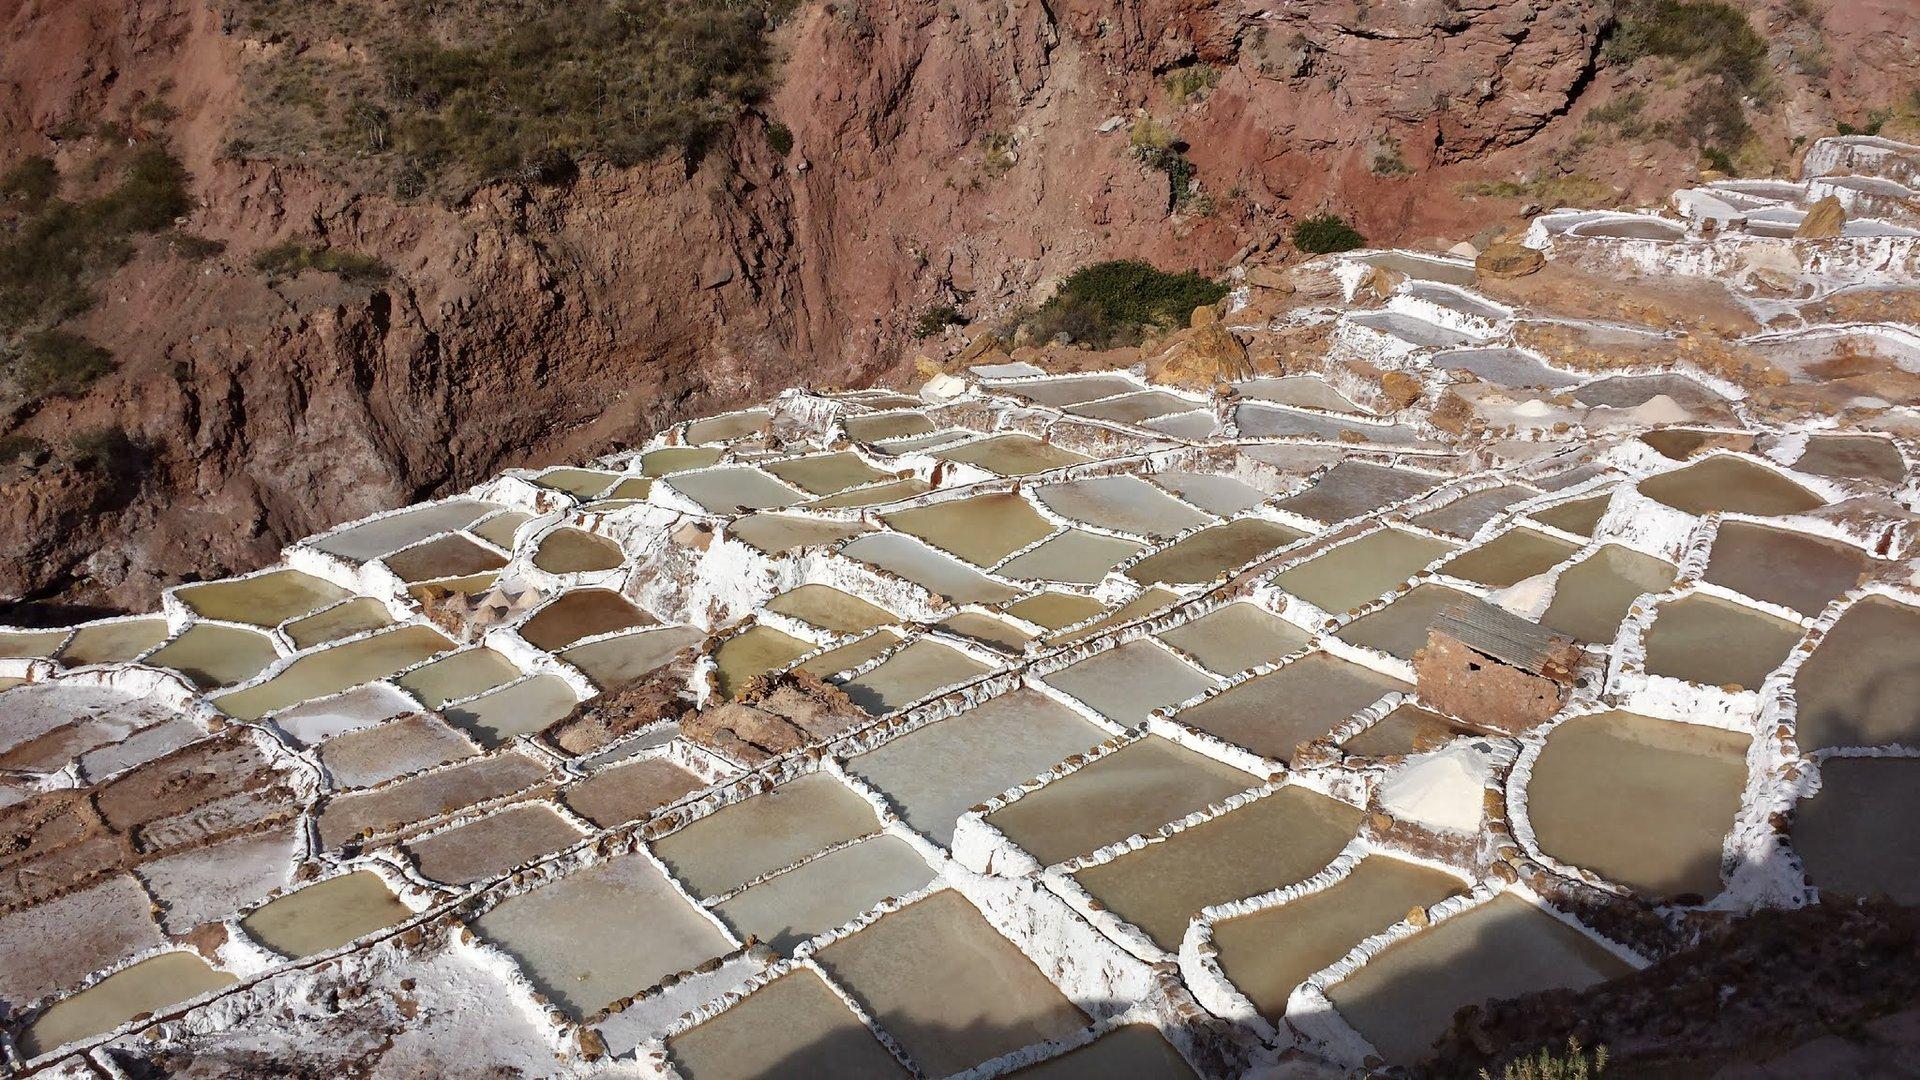 Salinas de Mara dans la vallée sacrée près de Cuzco